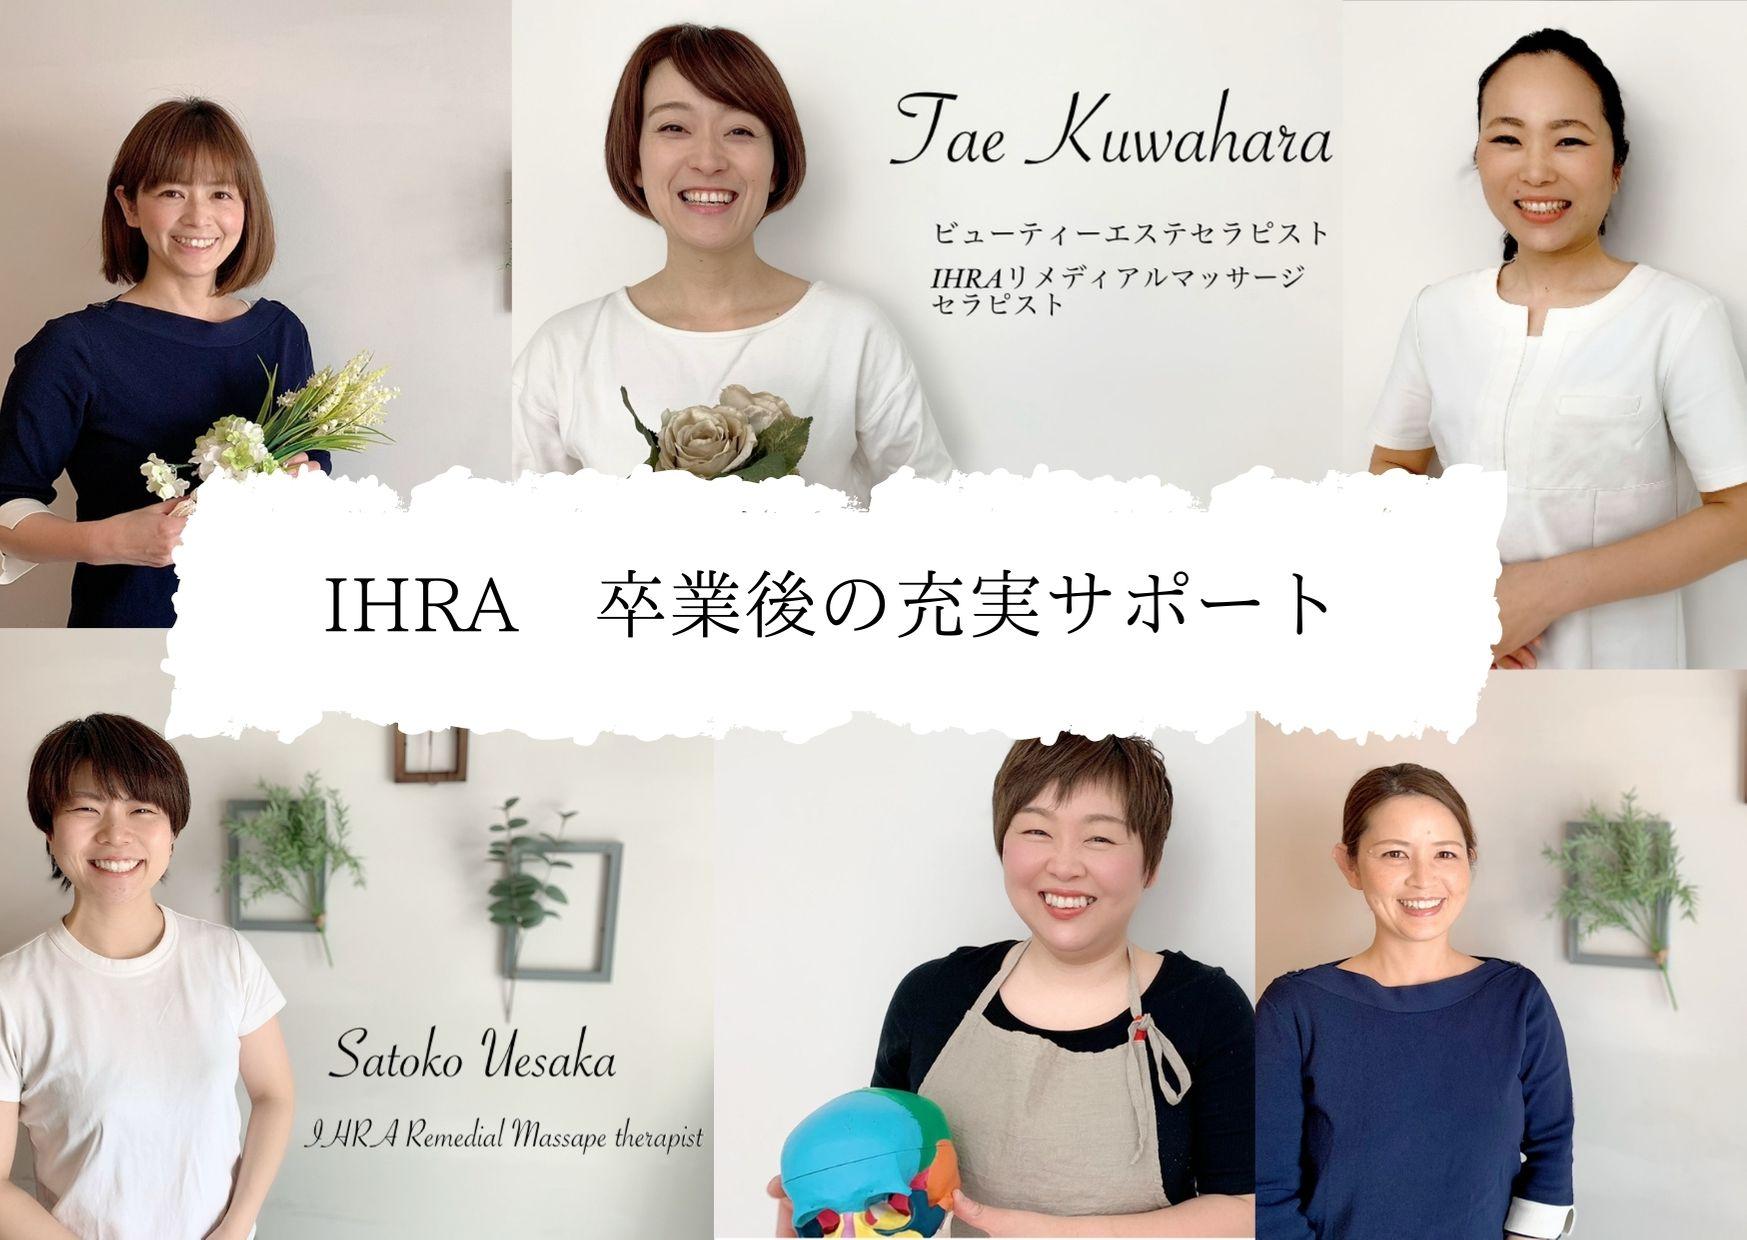 IHRAの卒業後のサポート